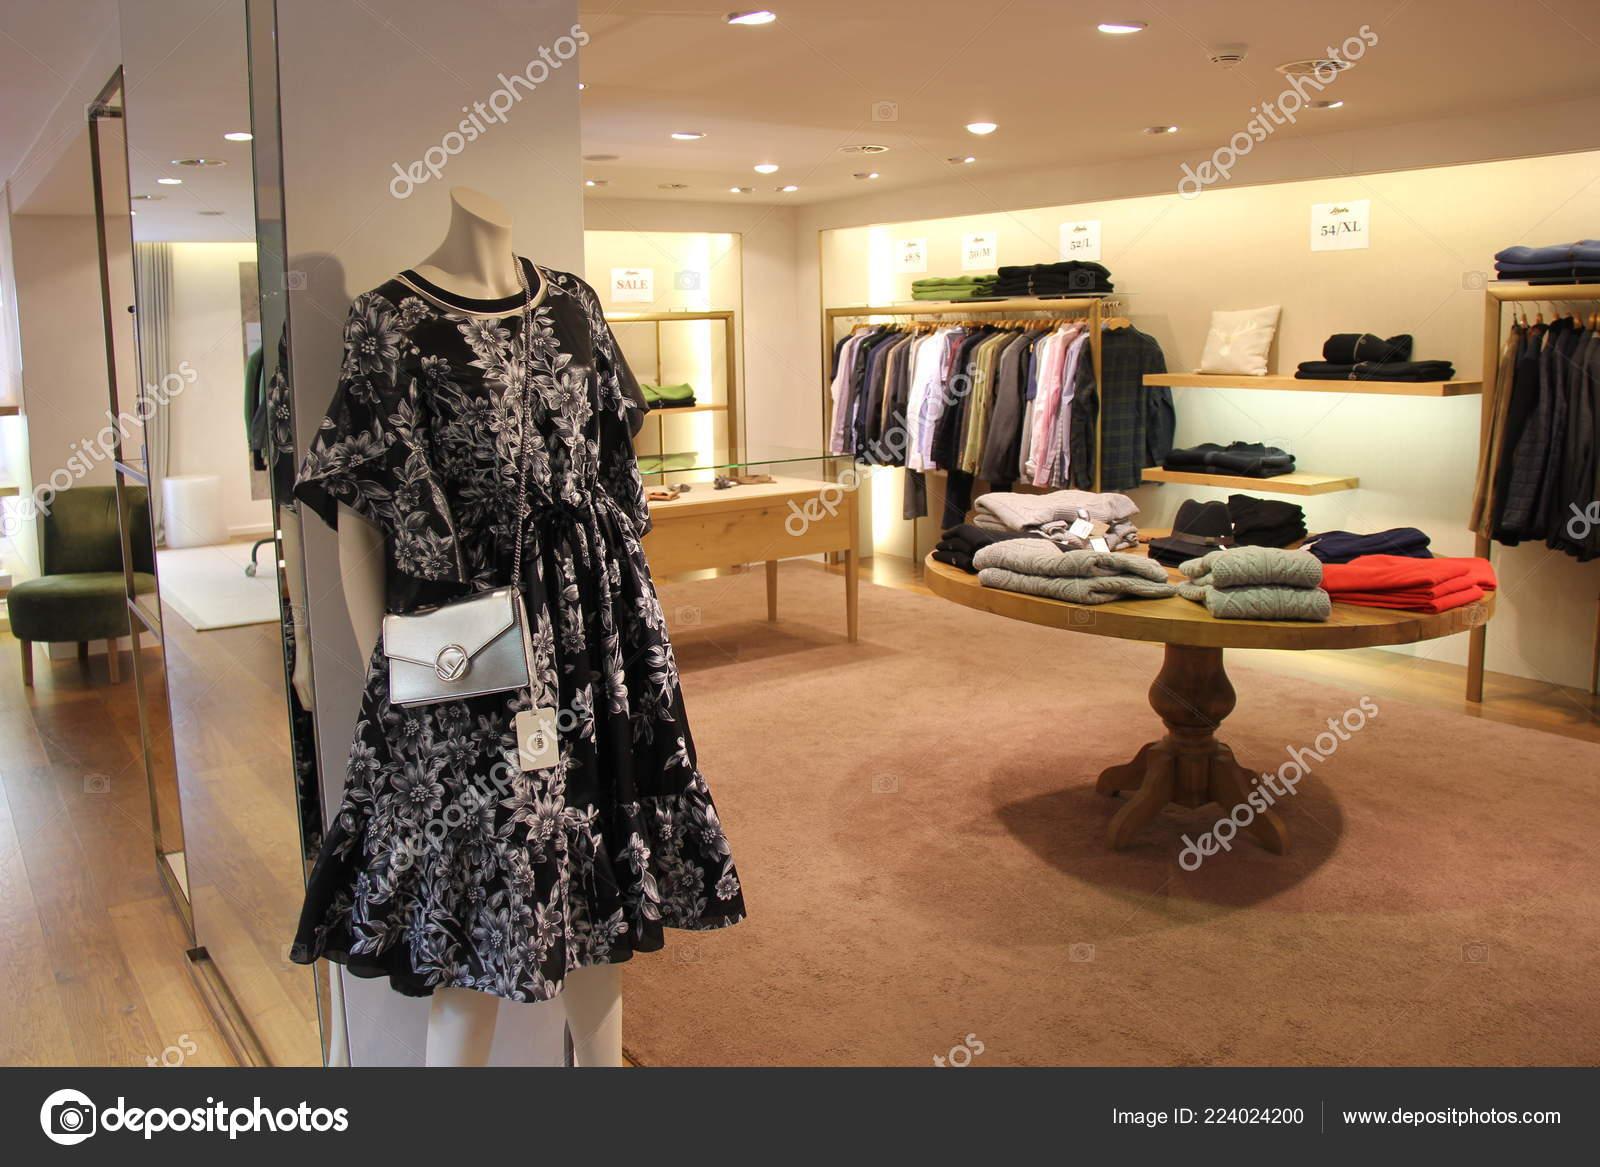 01e1a2e4de120 Lech Áustria 2018 Bolsa Fendi Roupas Grife Loja Moda — Fotografia de Stock